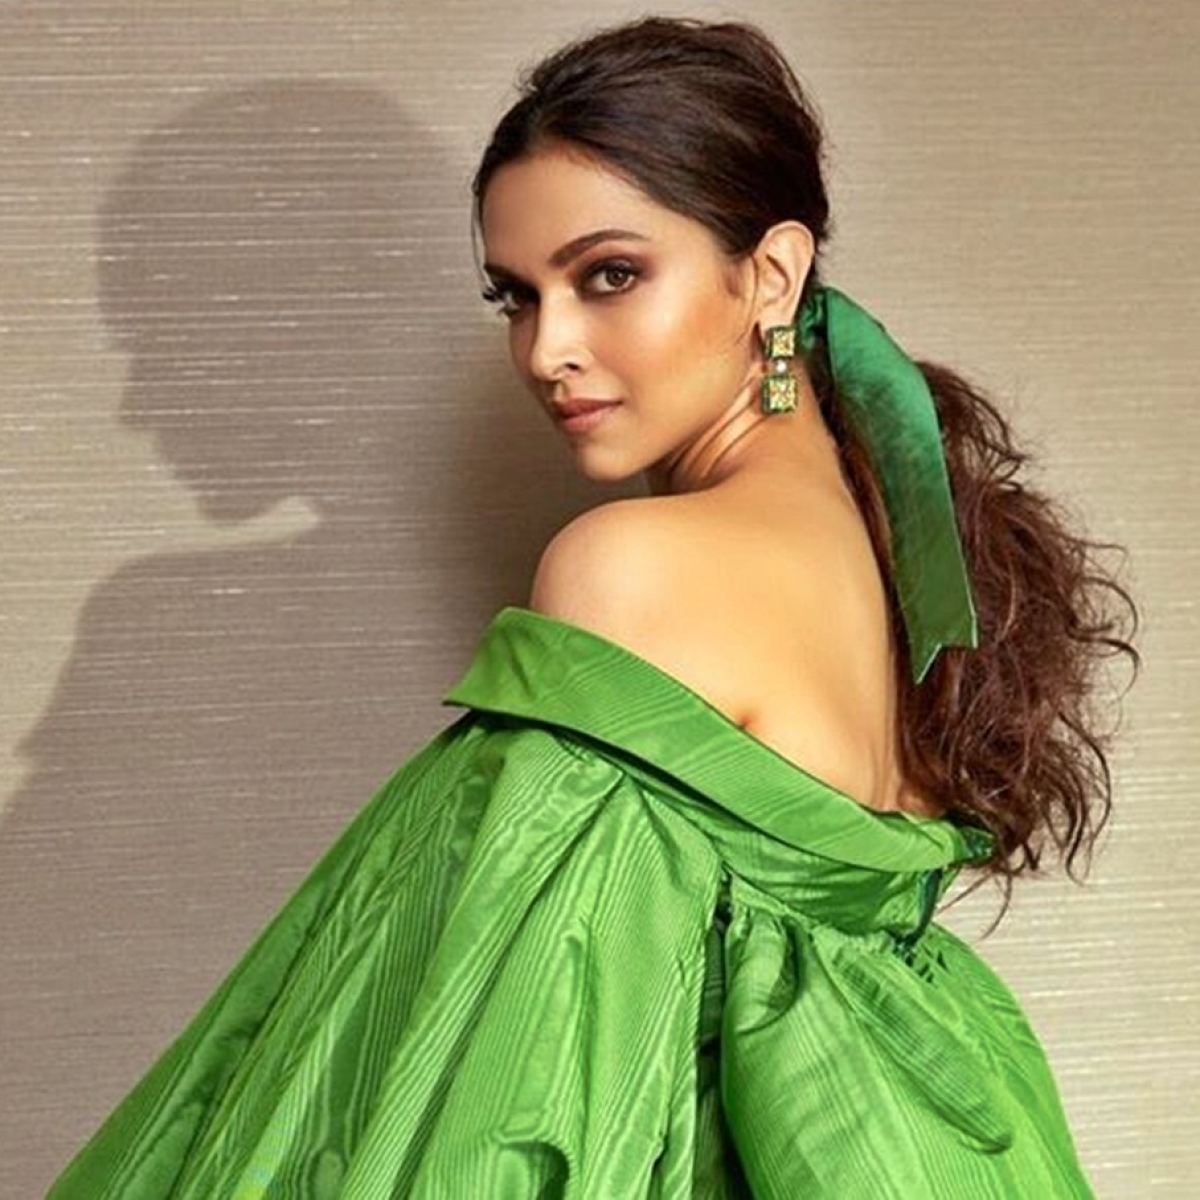 Ranveer Singh impressed by Deepika Padukone's 'Shuddha Desi Caption'